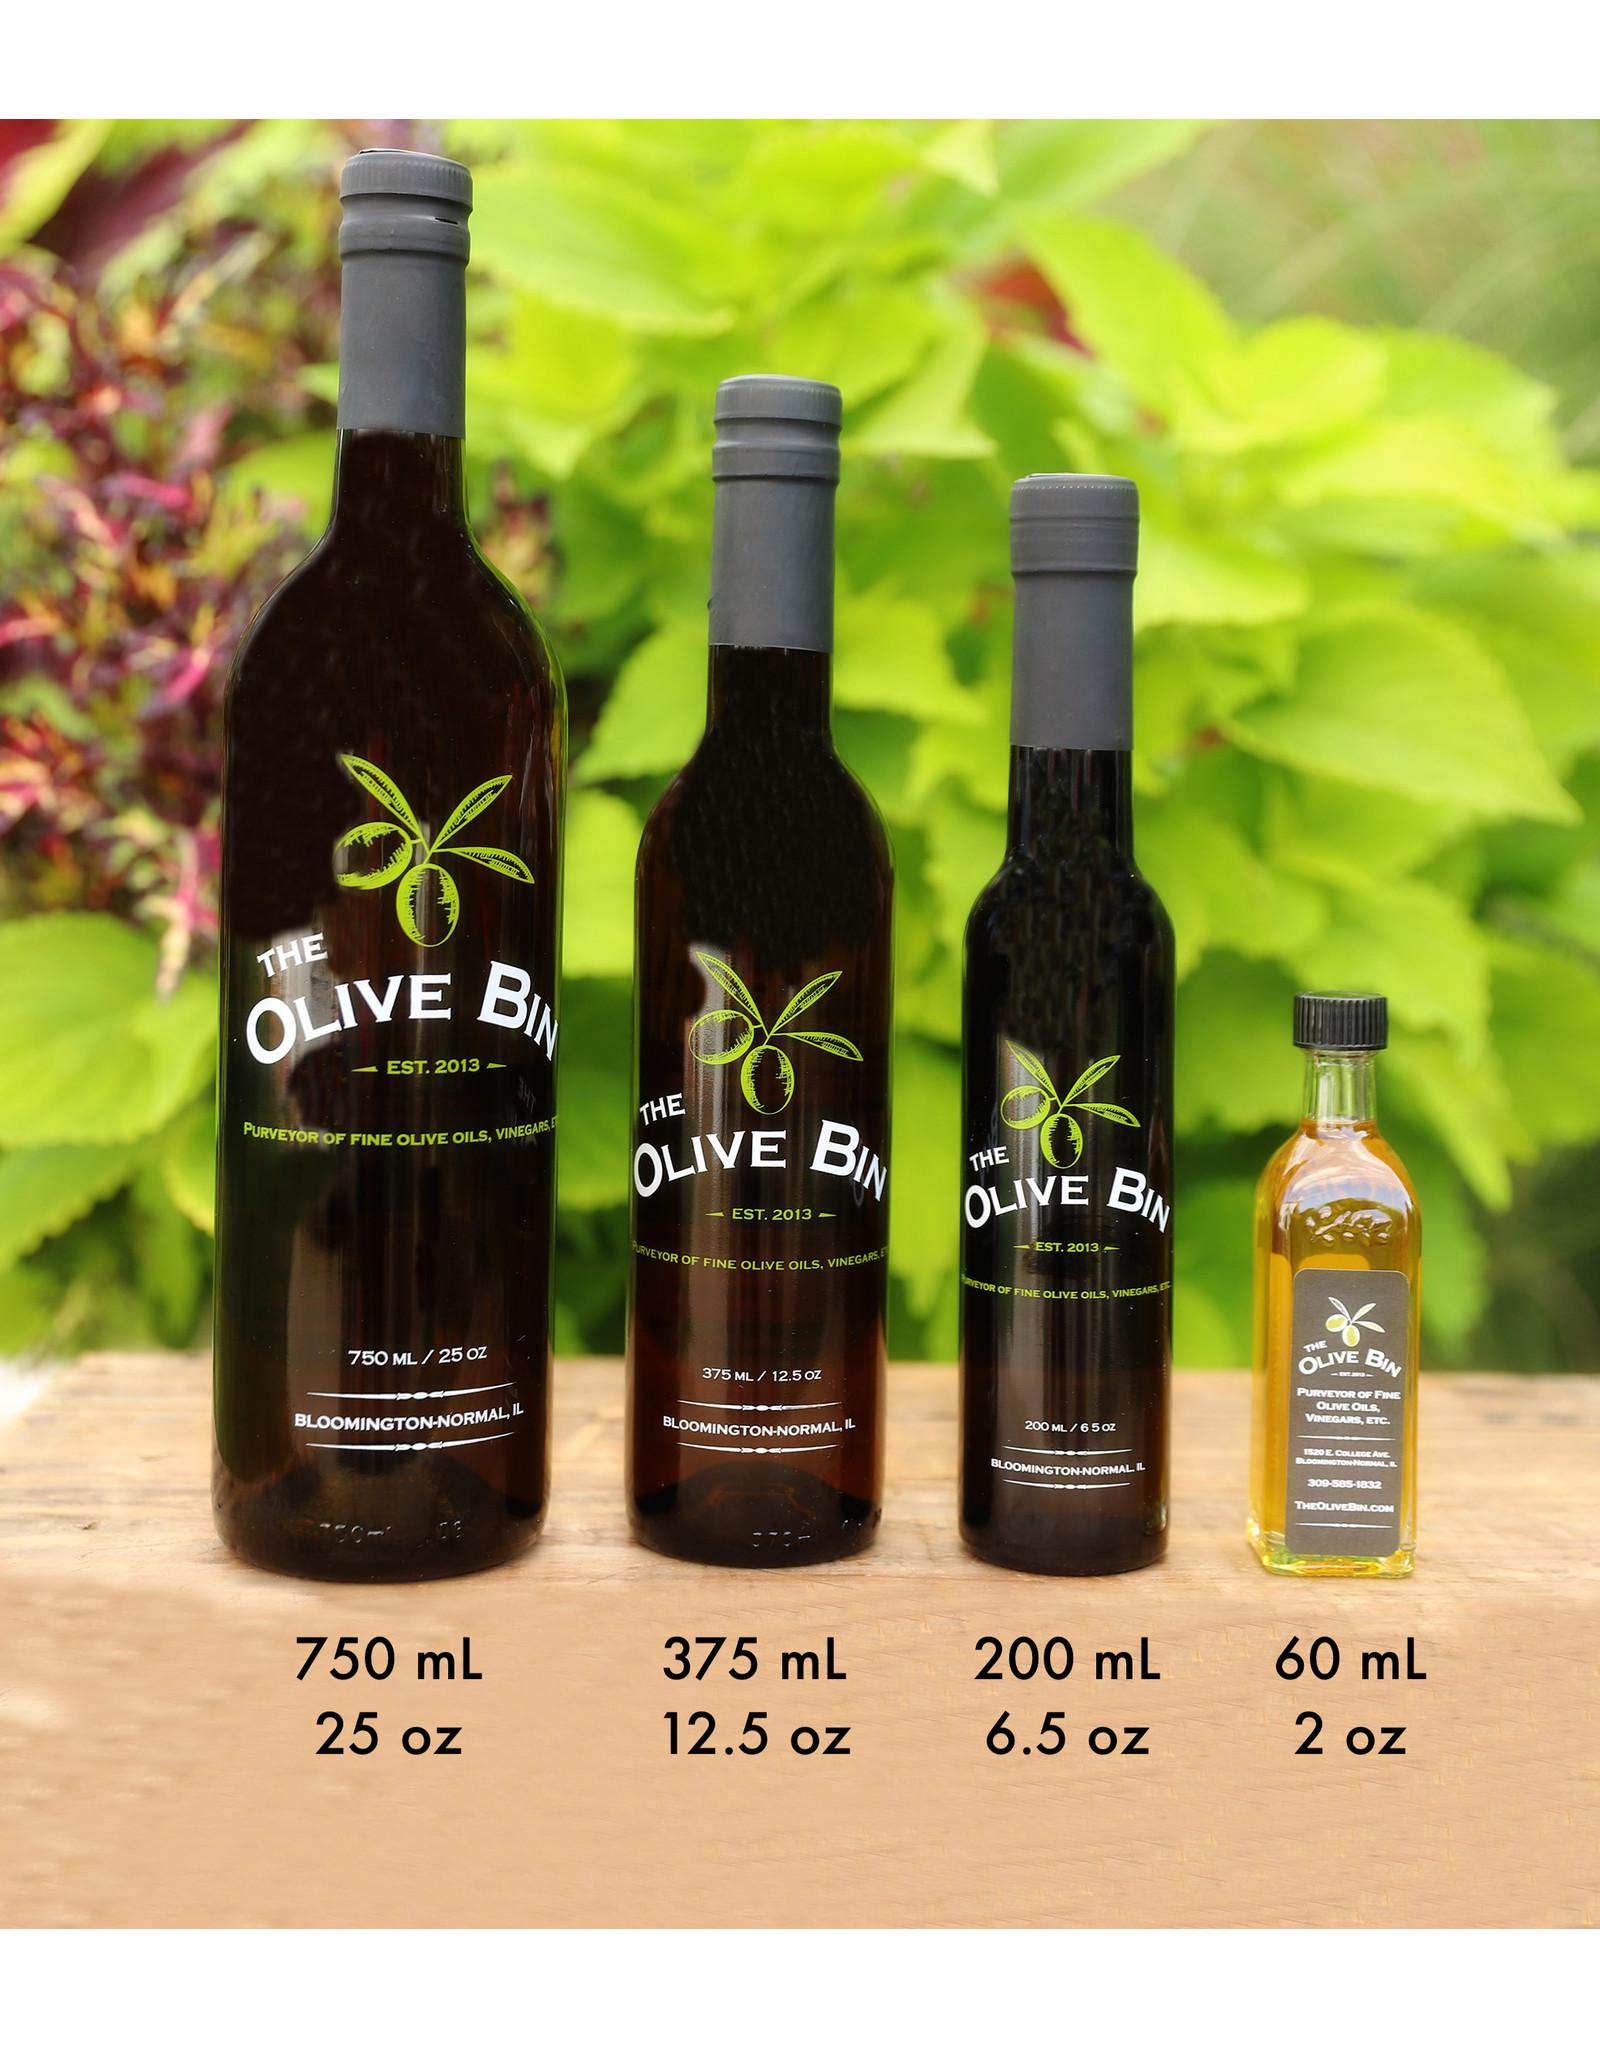 Green Chili Olive Oil